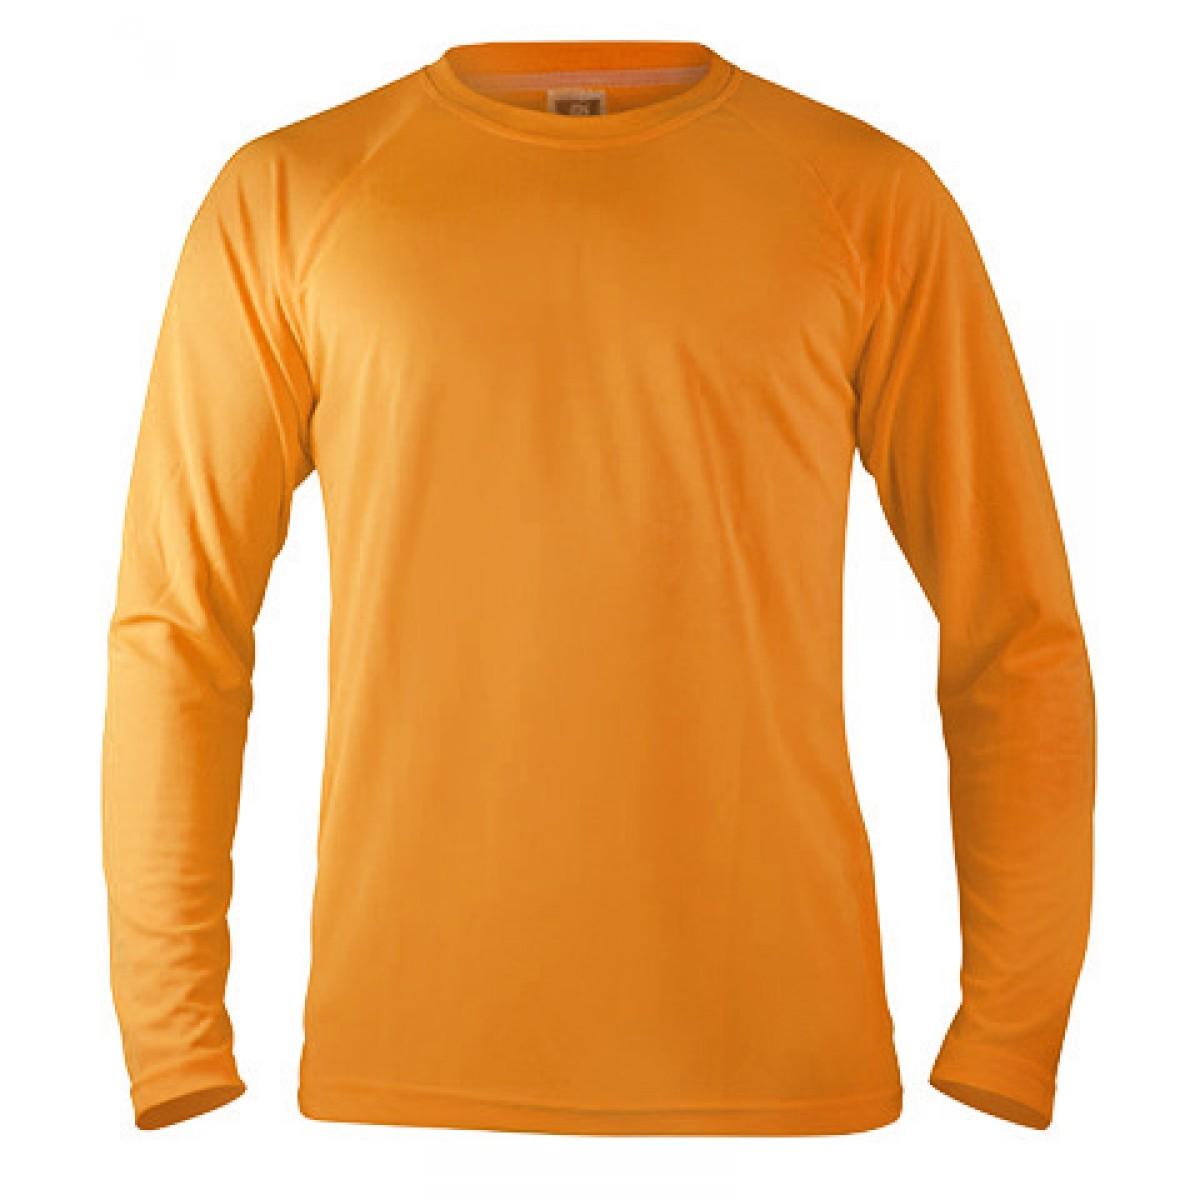 Long Sleeve Mesh Performance T-shirt-Neon Orange -M